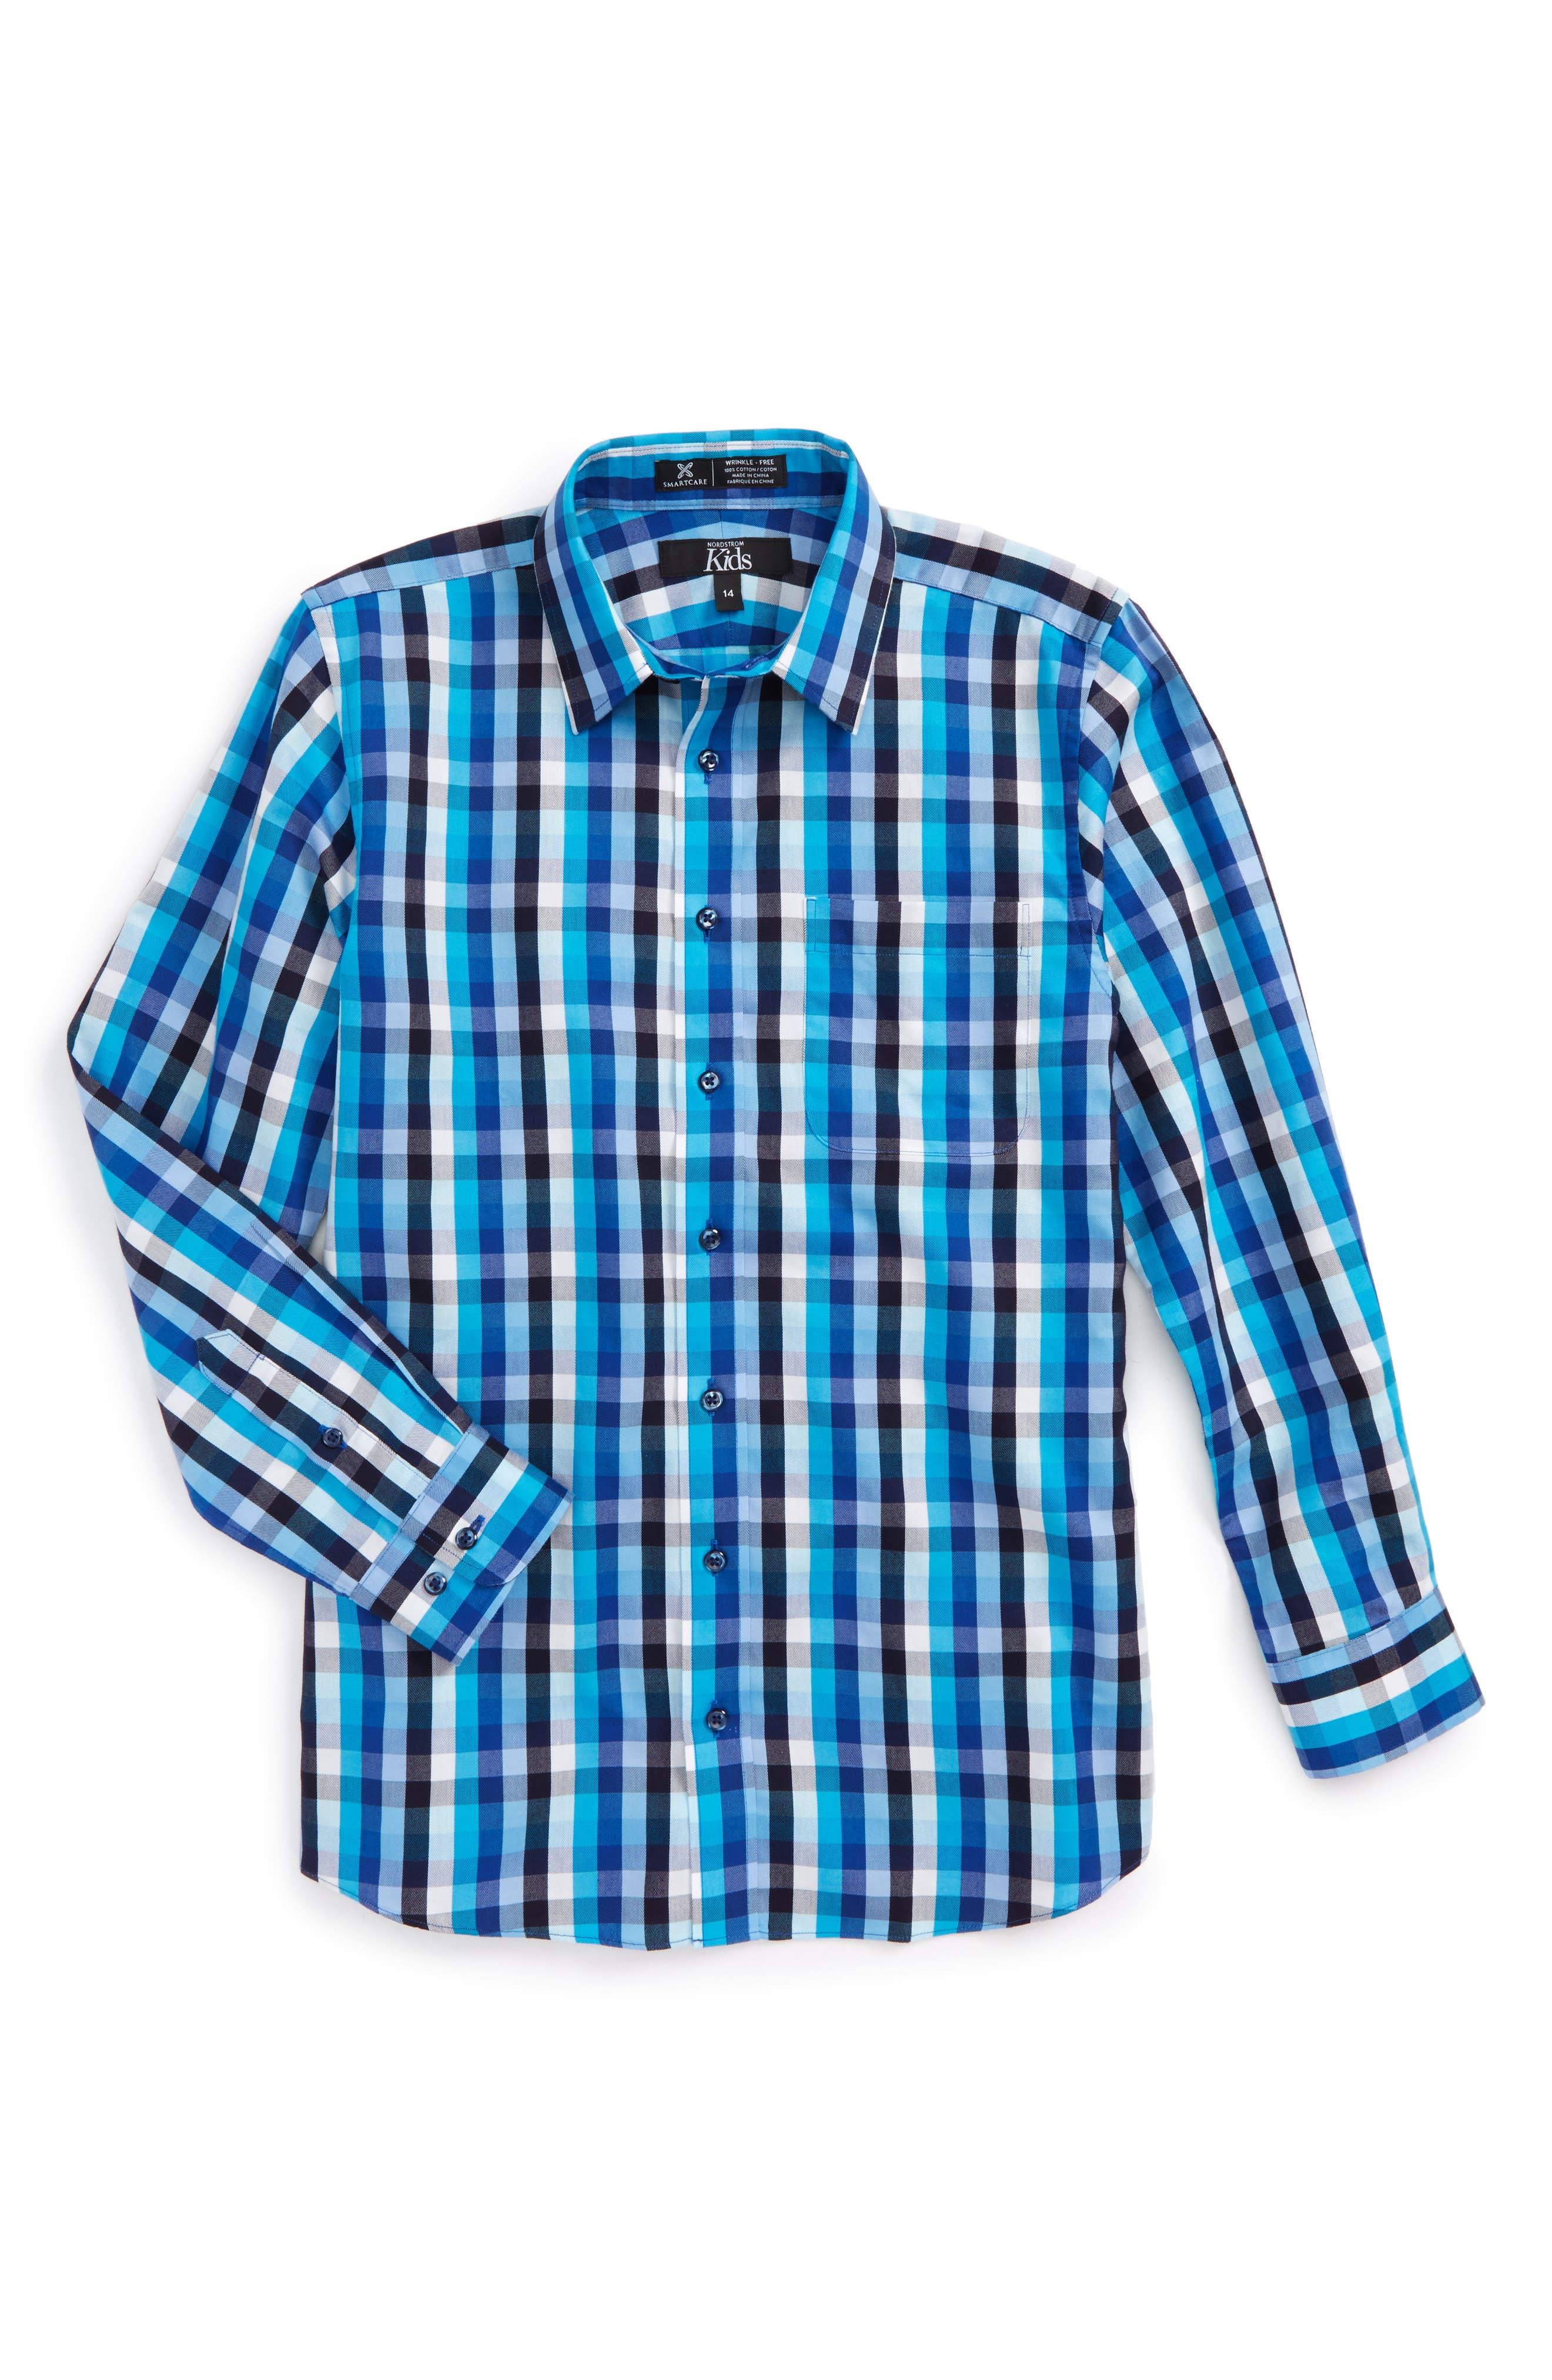 Main Image - Nordstrom Smartcare™ Danube Plaid Dress Shirt (Big Boys)